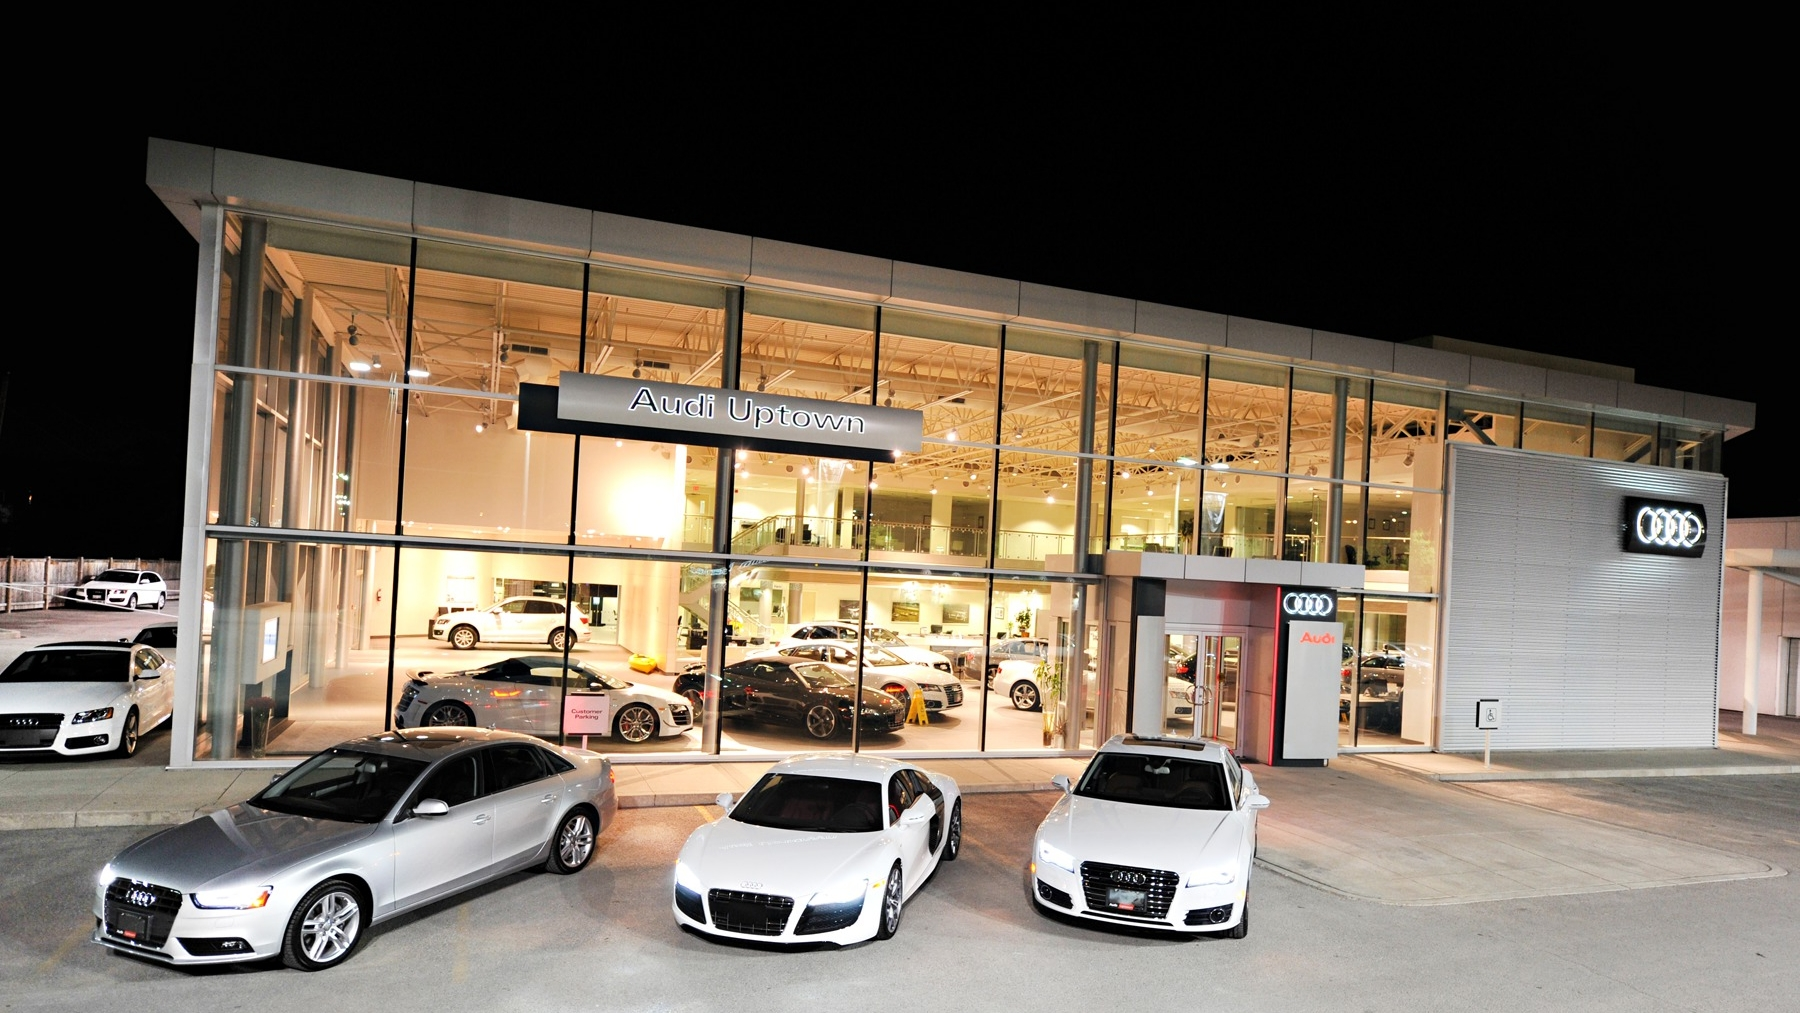 Toronto And Markham Porsche Audi Dealership Serving Toronto - Audi toronto